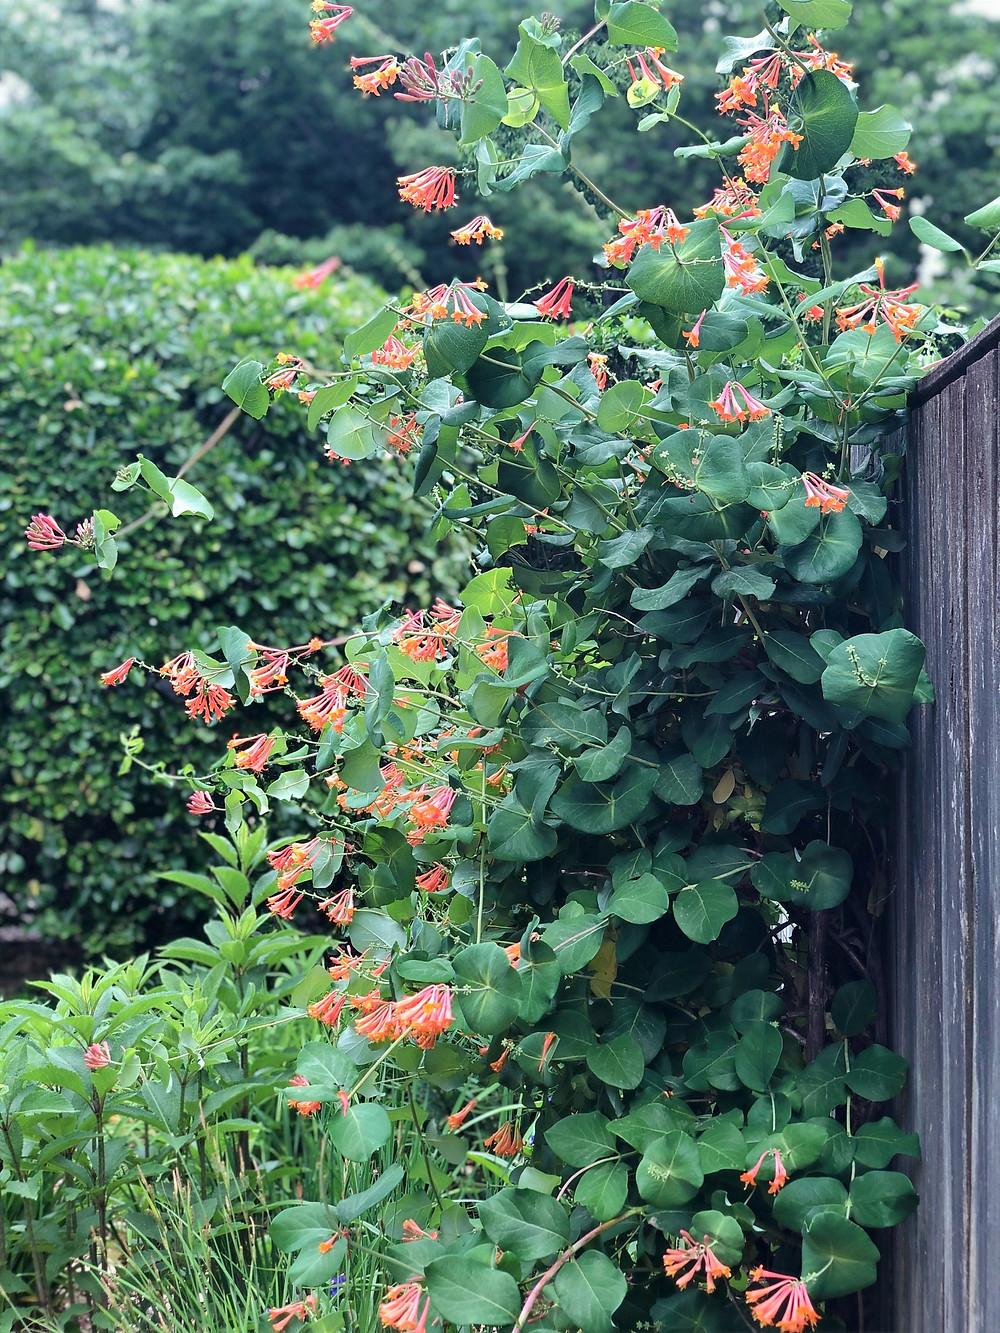 Native trumpet vine along wooden fence